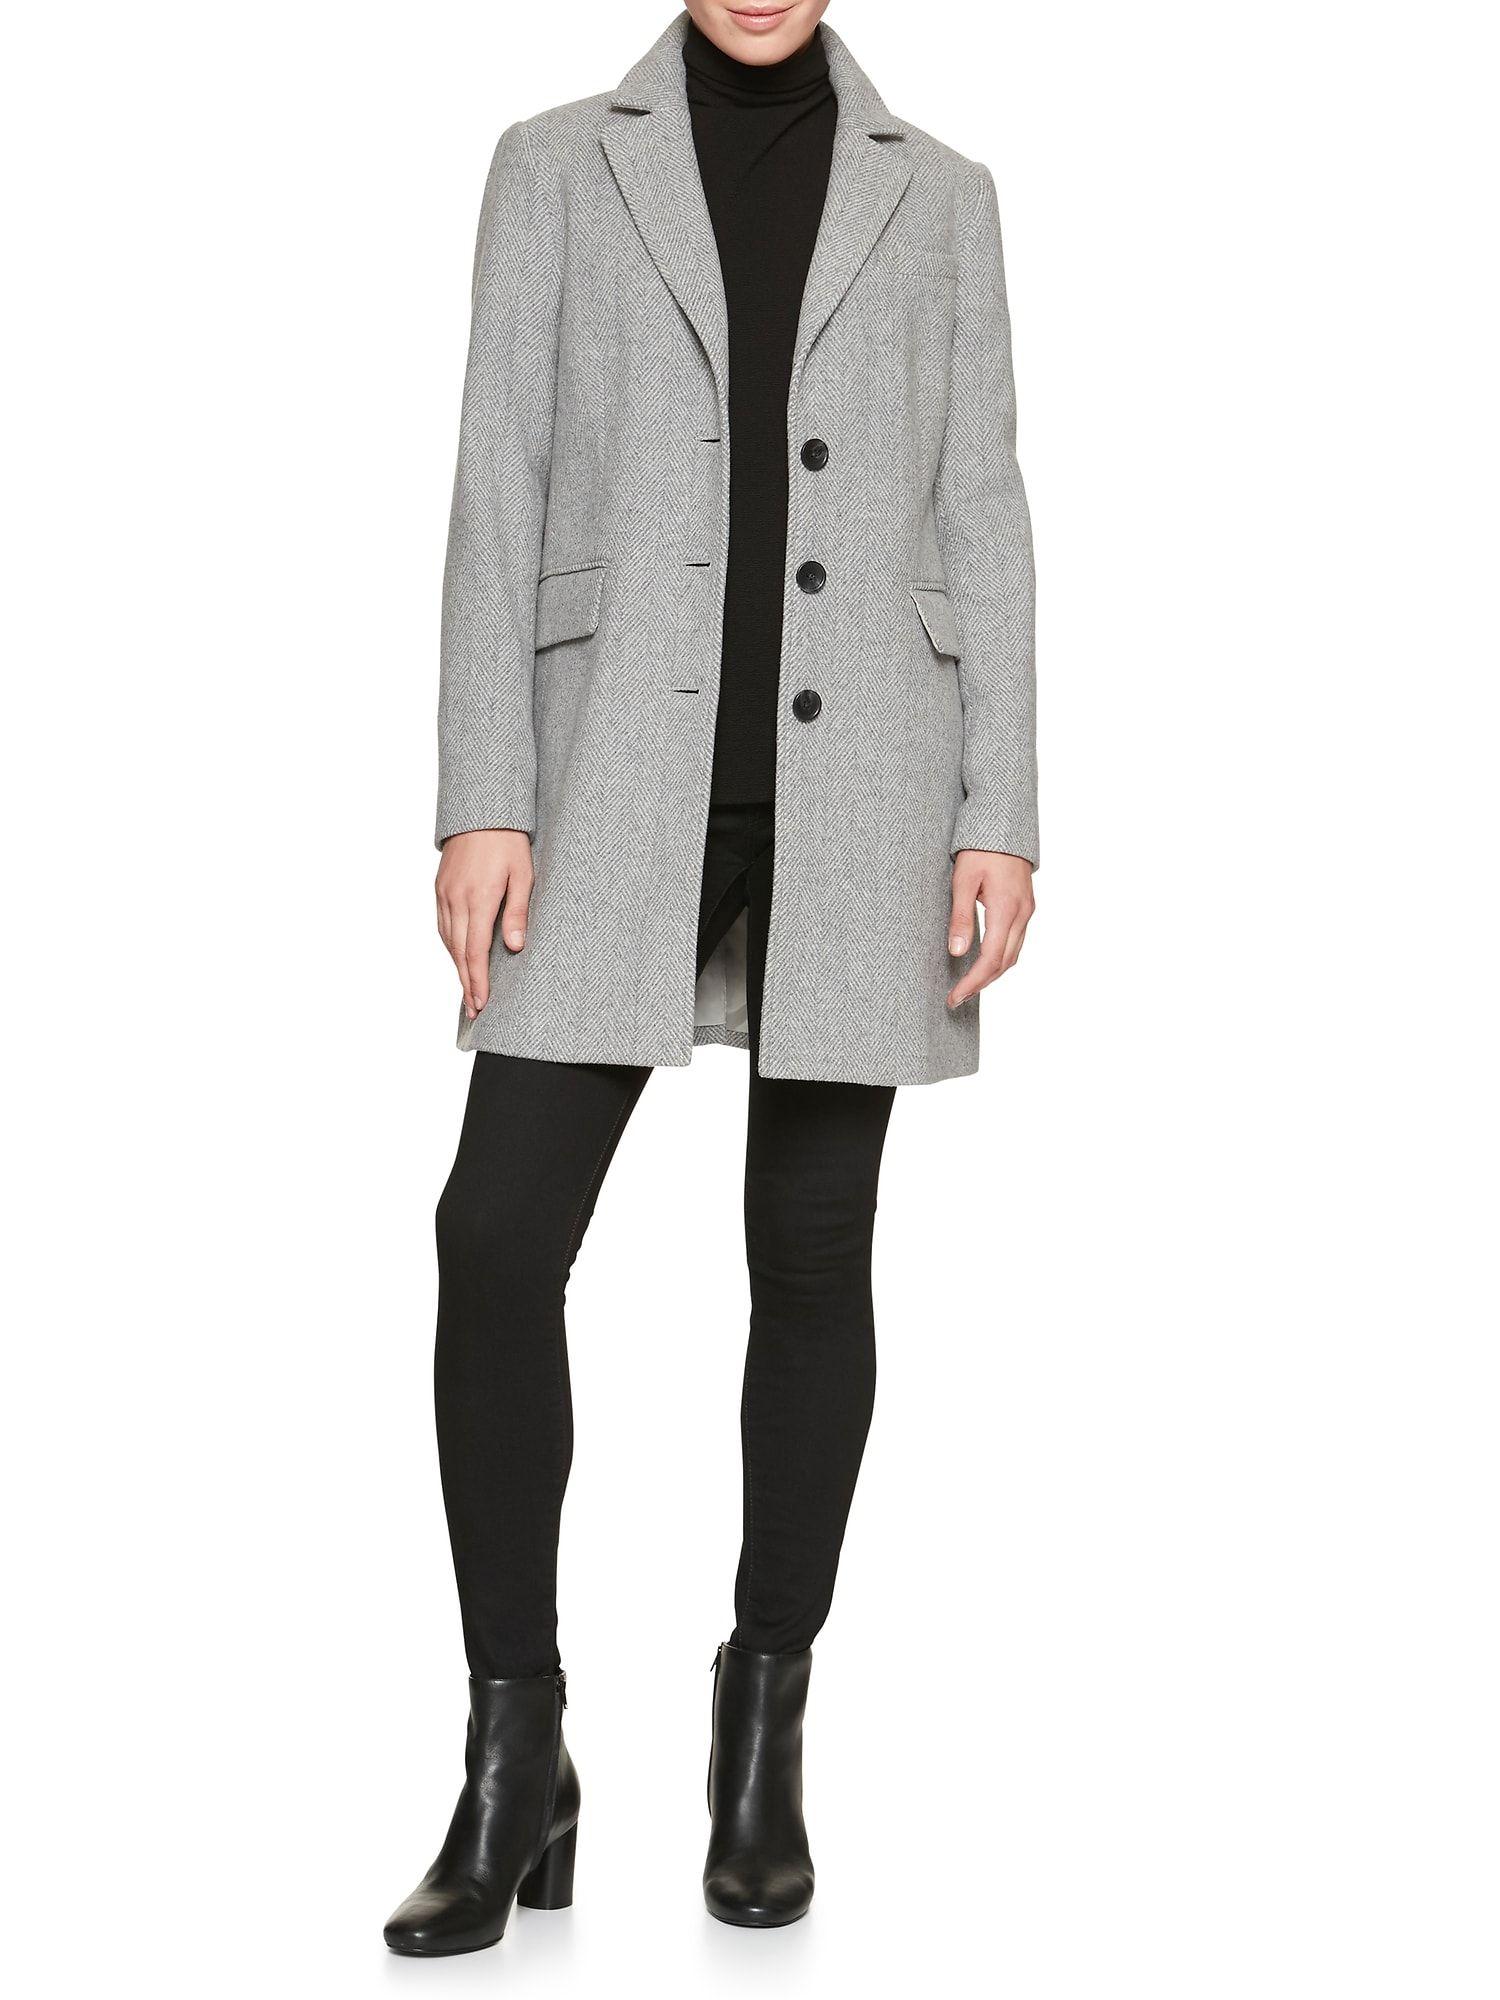 Petite Herringbone Top Coat Banana Republic Factory Petite Jacket Womens Petite Coats Outerwear [ 2000 x 1500 Pixel ]